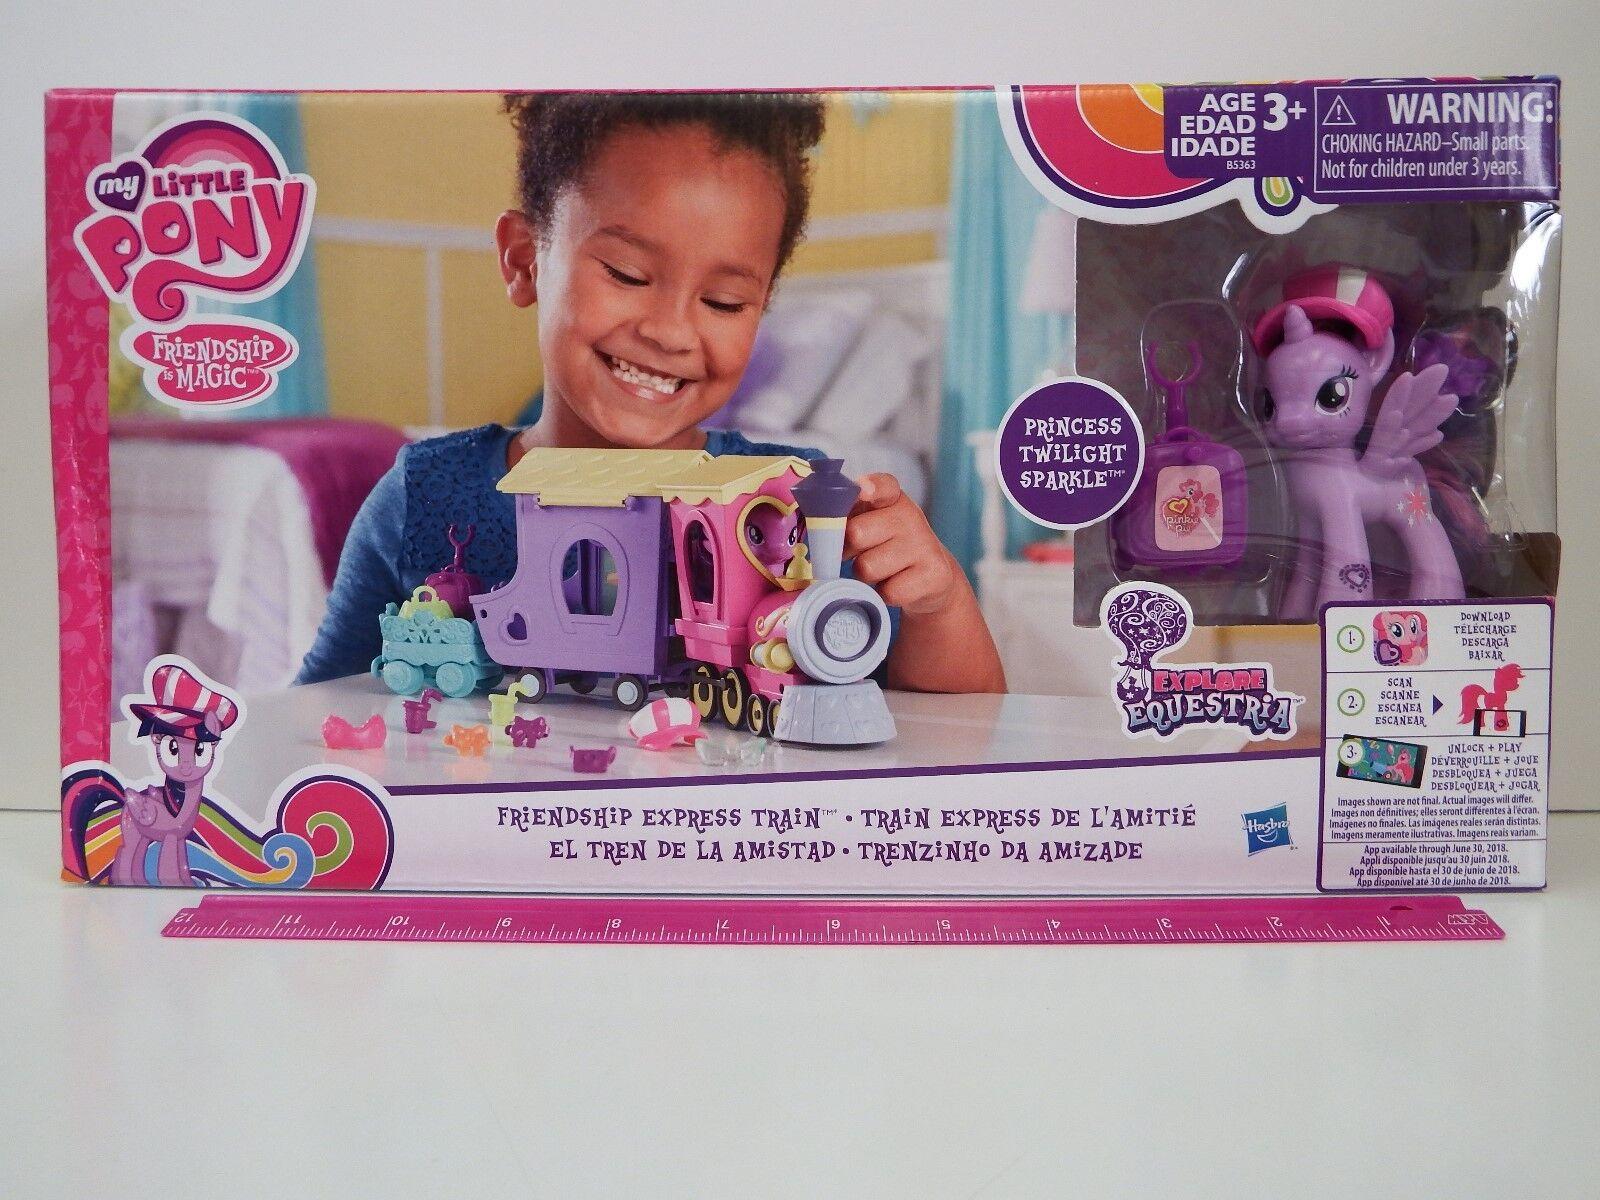 My Little Pony Friendship Friendship Friendship is Magic FRIENDSHIP EXPRESS TRAIN - 10 Accessories 05223c